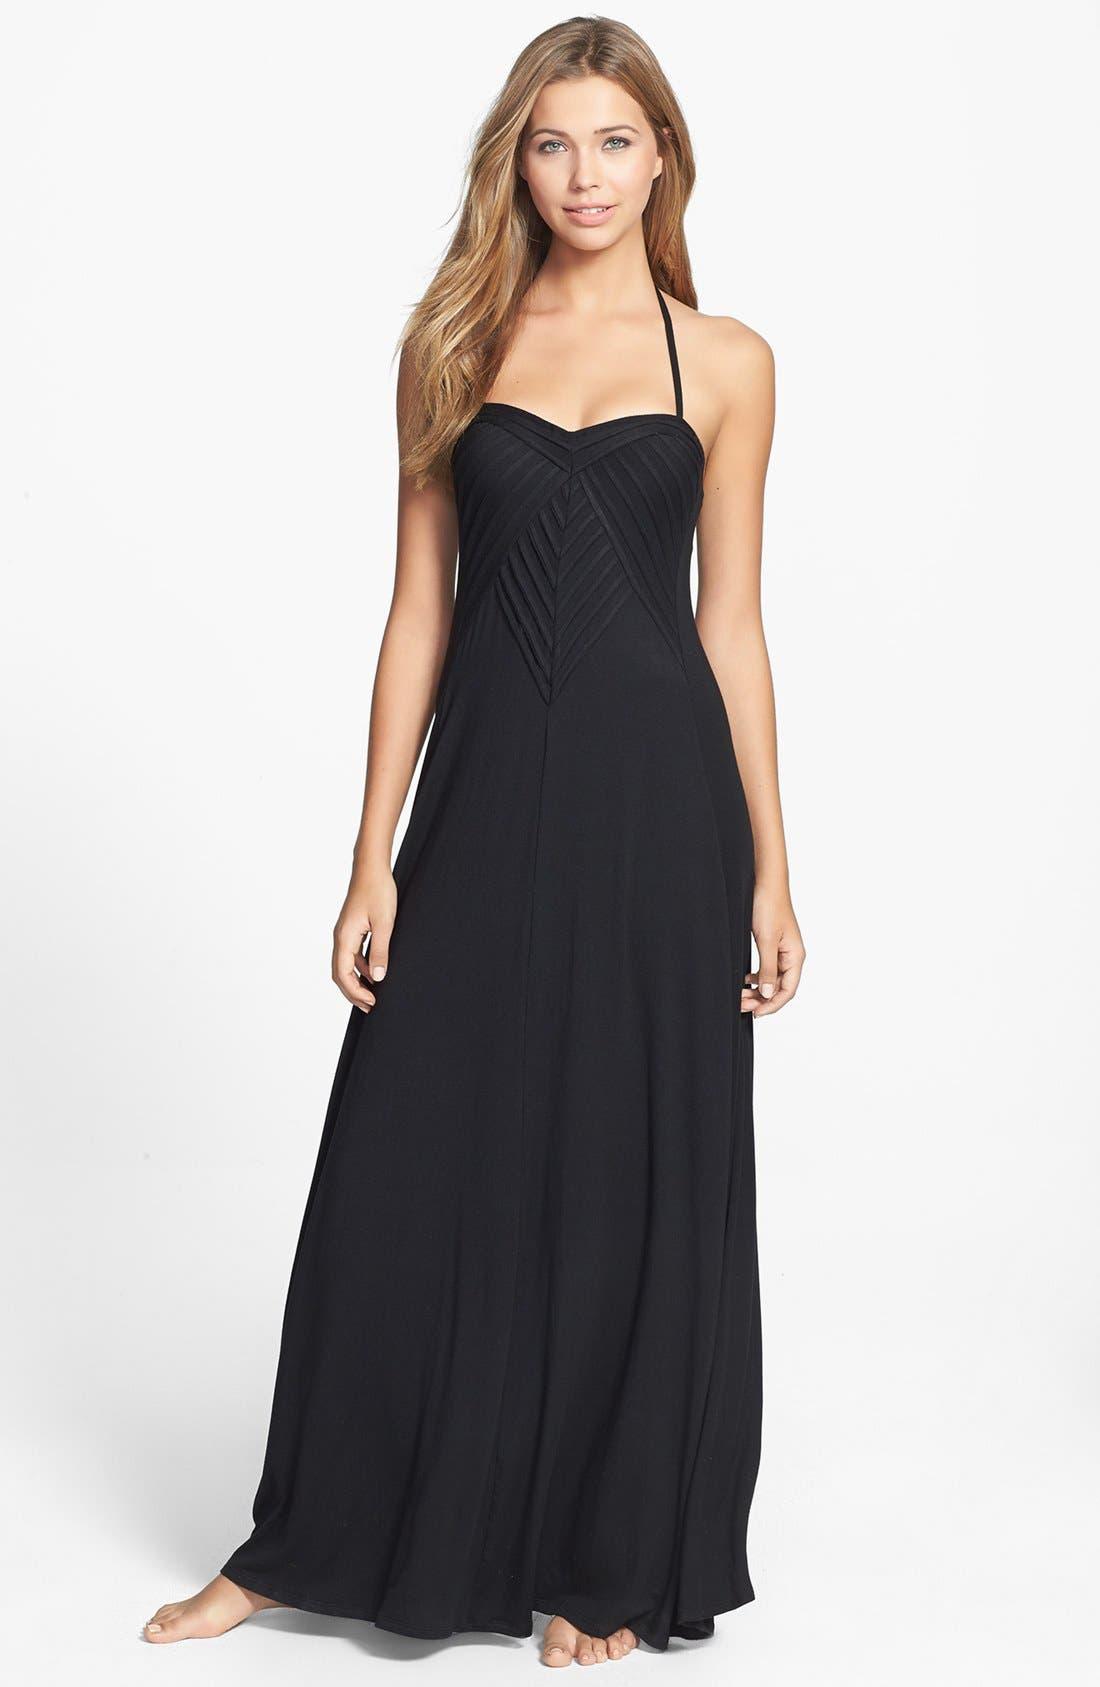 Alternate Image 1 Selected - Robin Piccone 'Karina' Pleat Cover-Up Maxi Dress